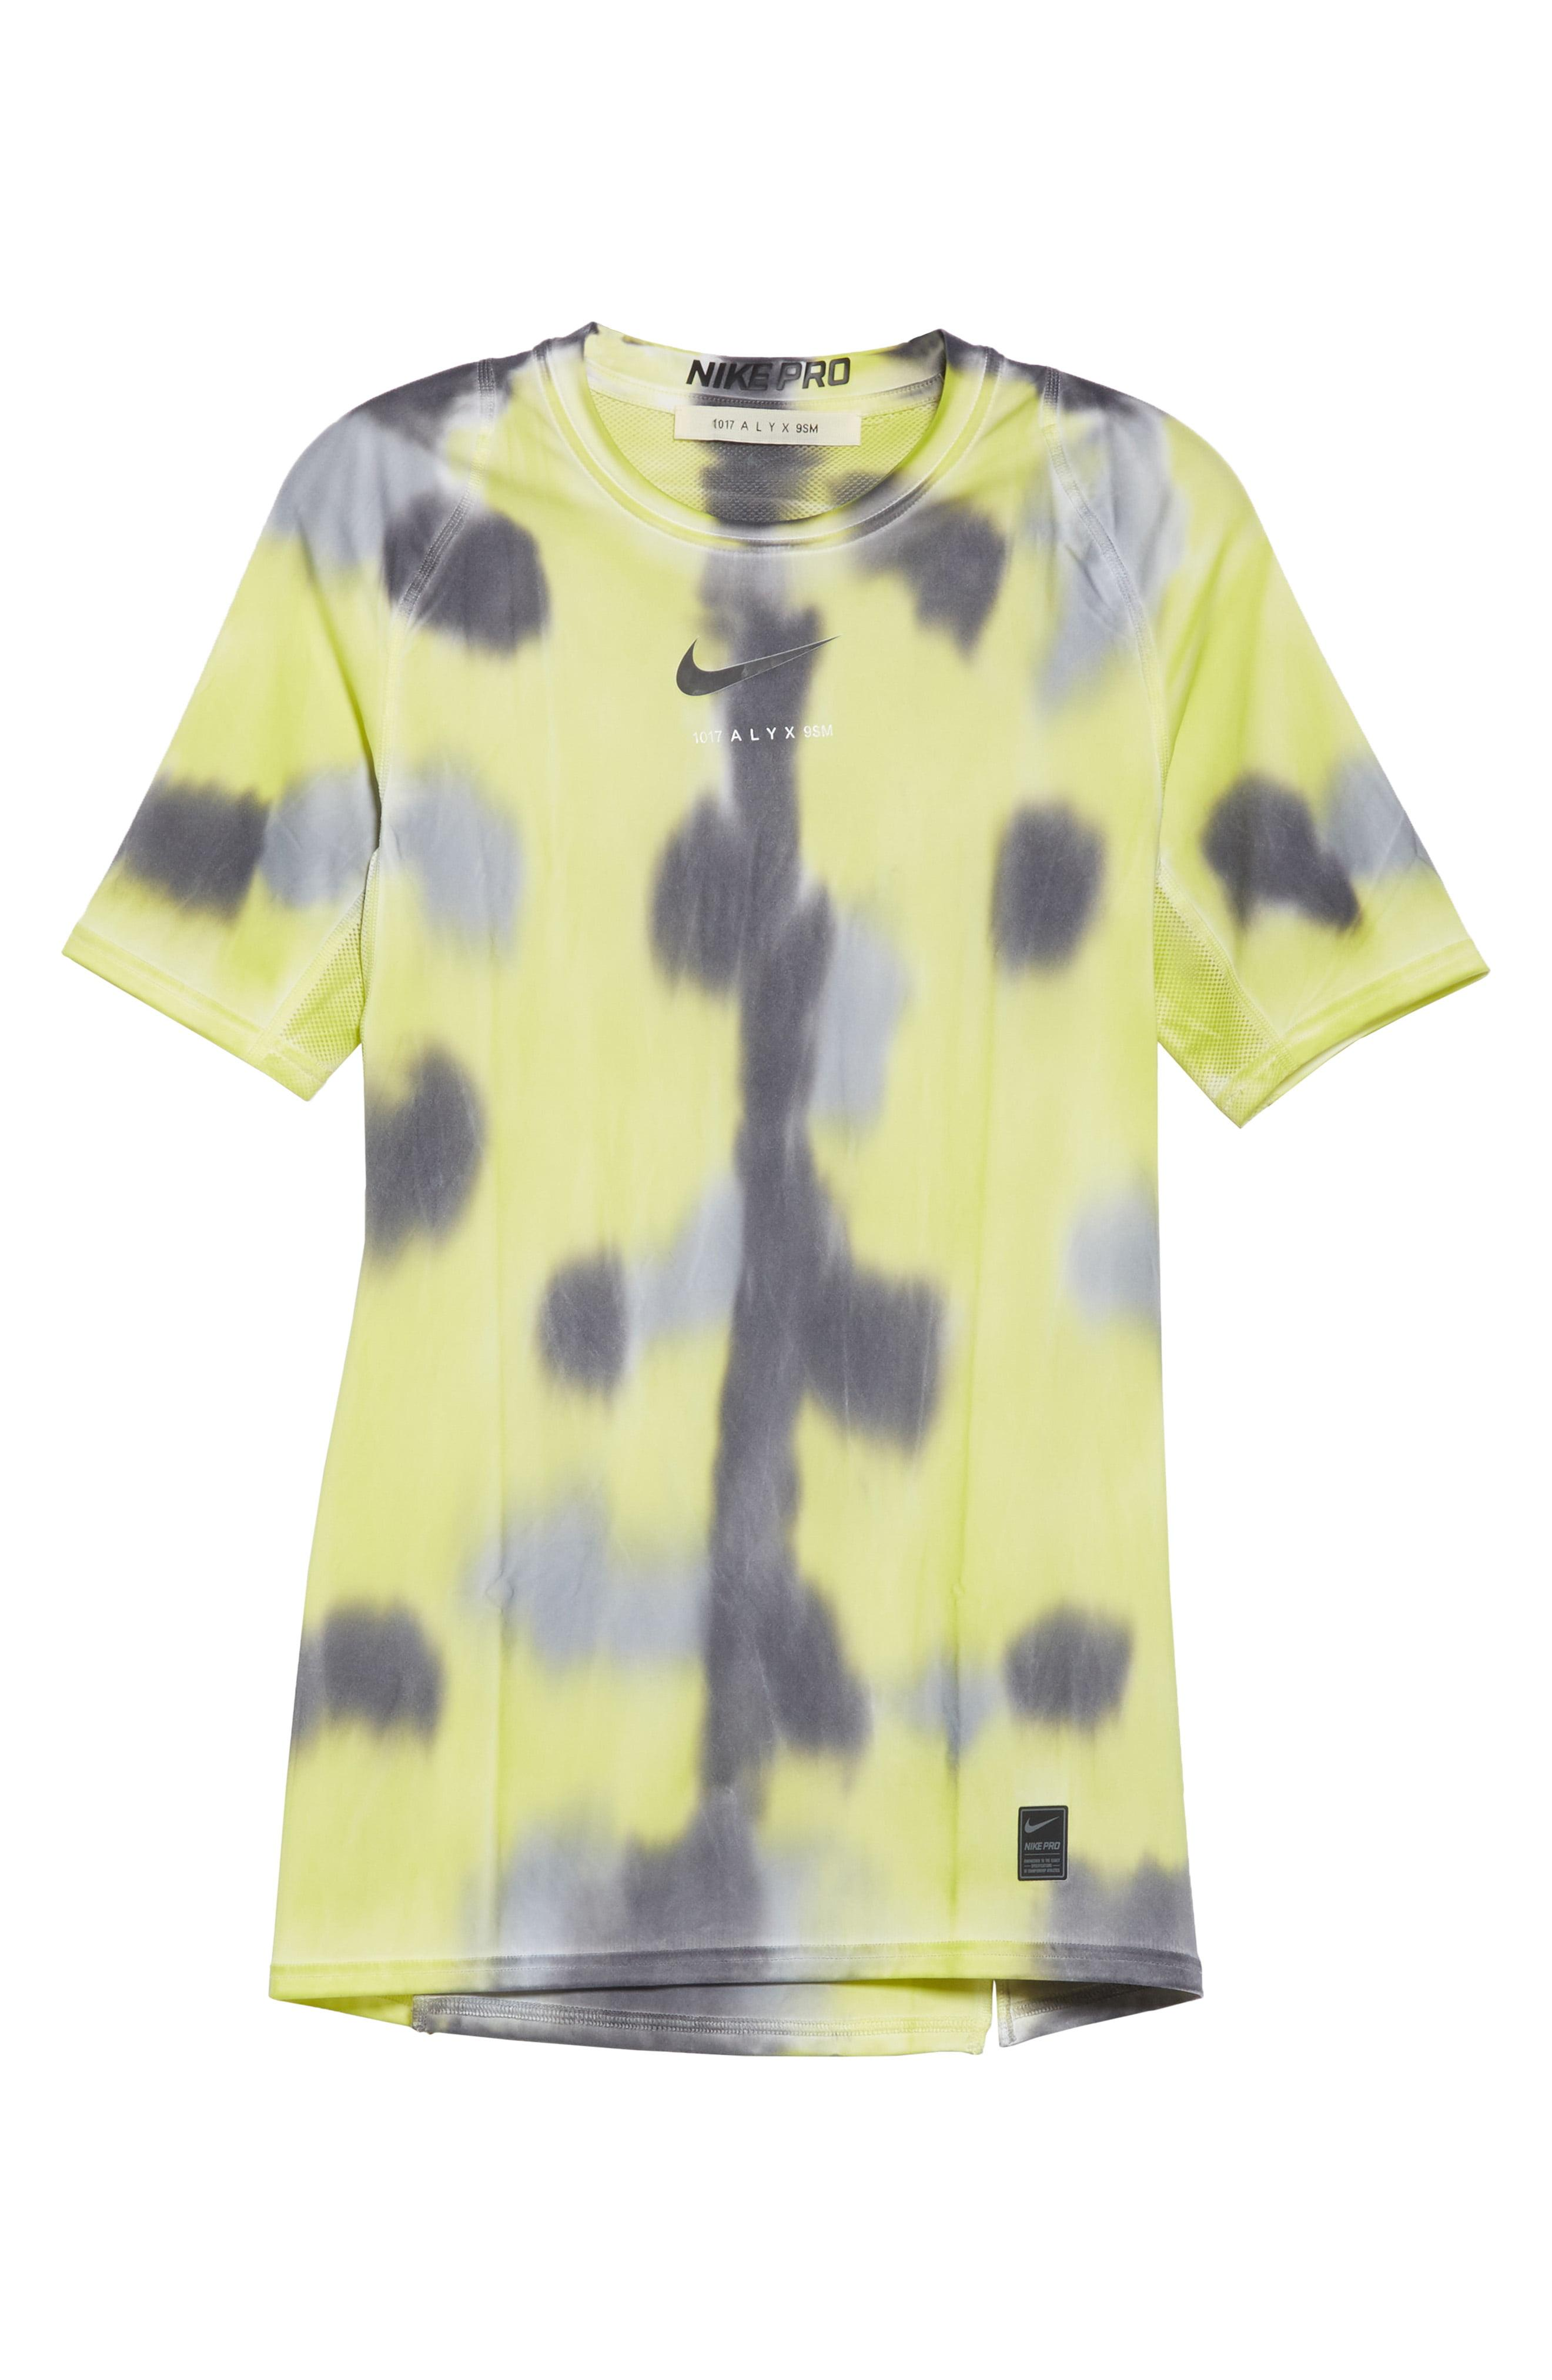 alyx x nike shirt